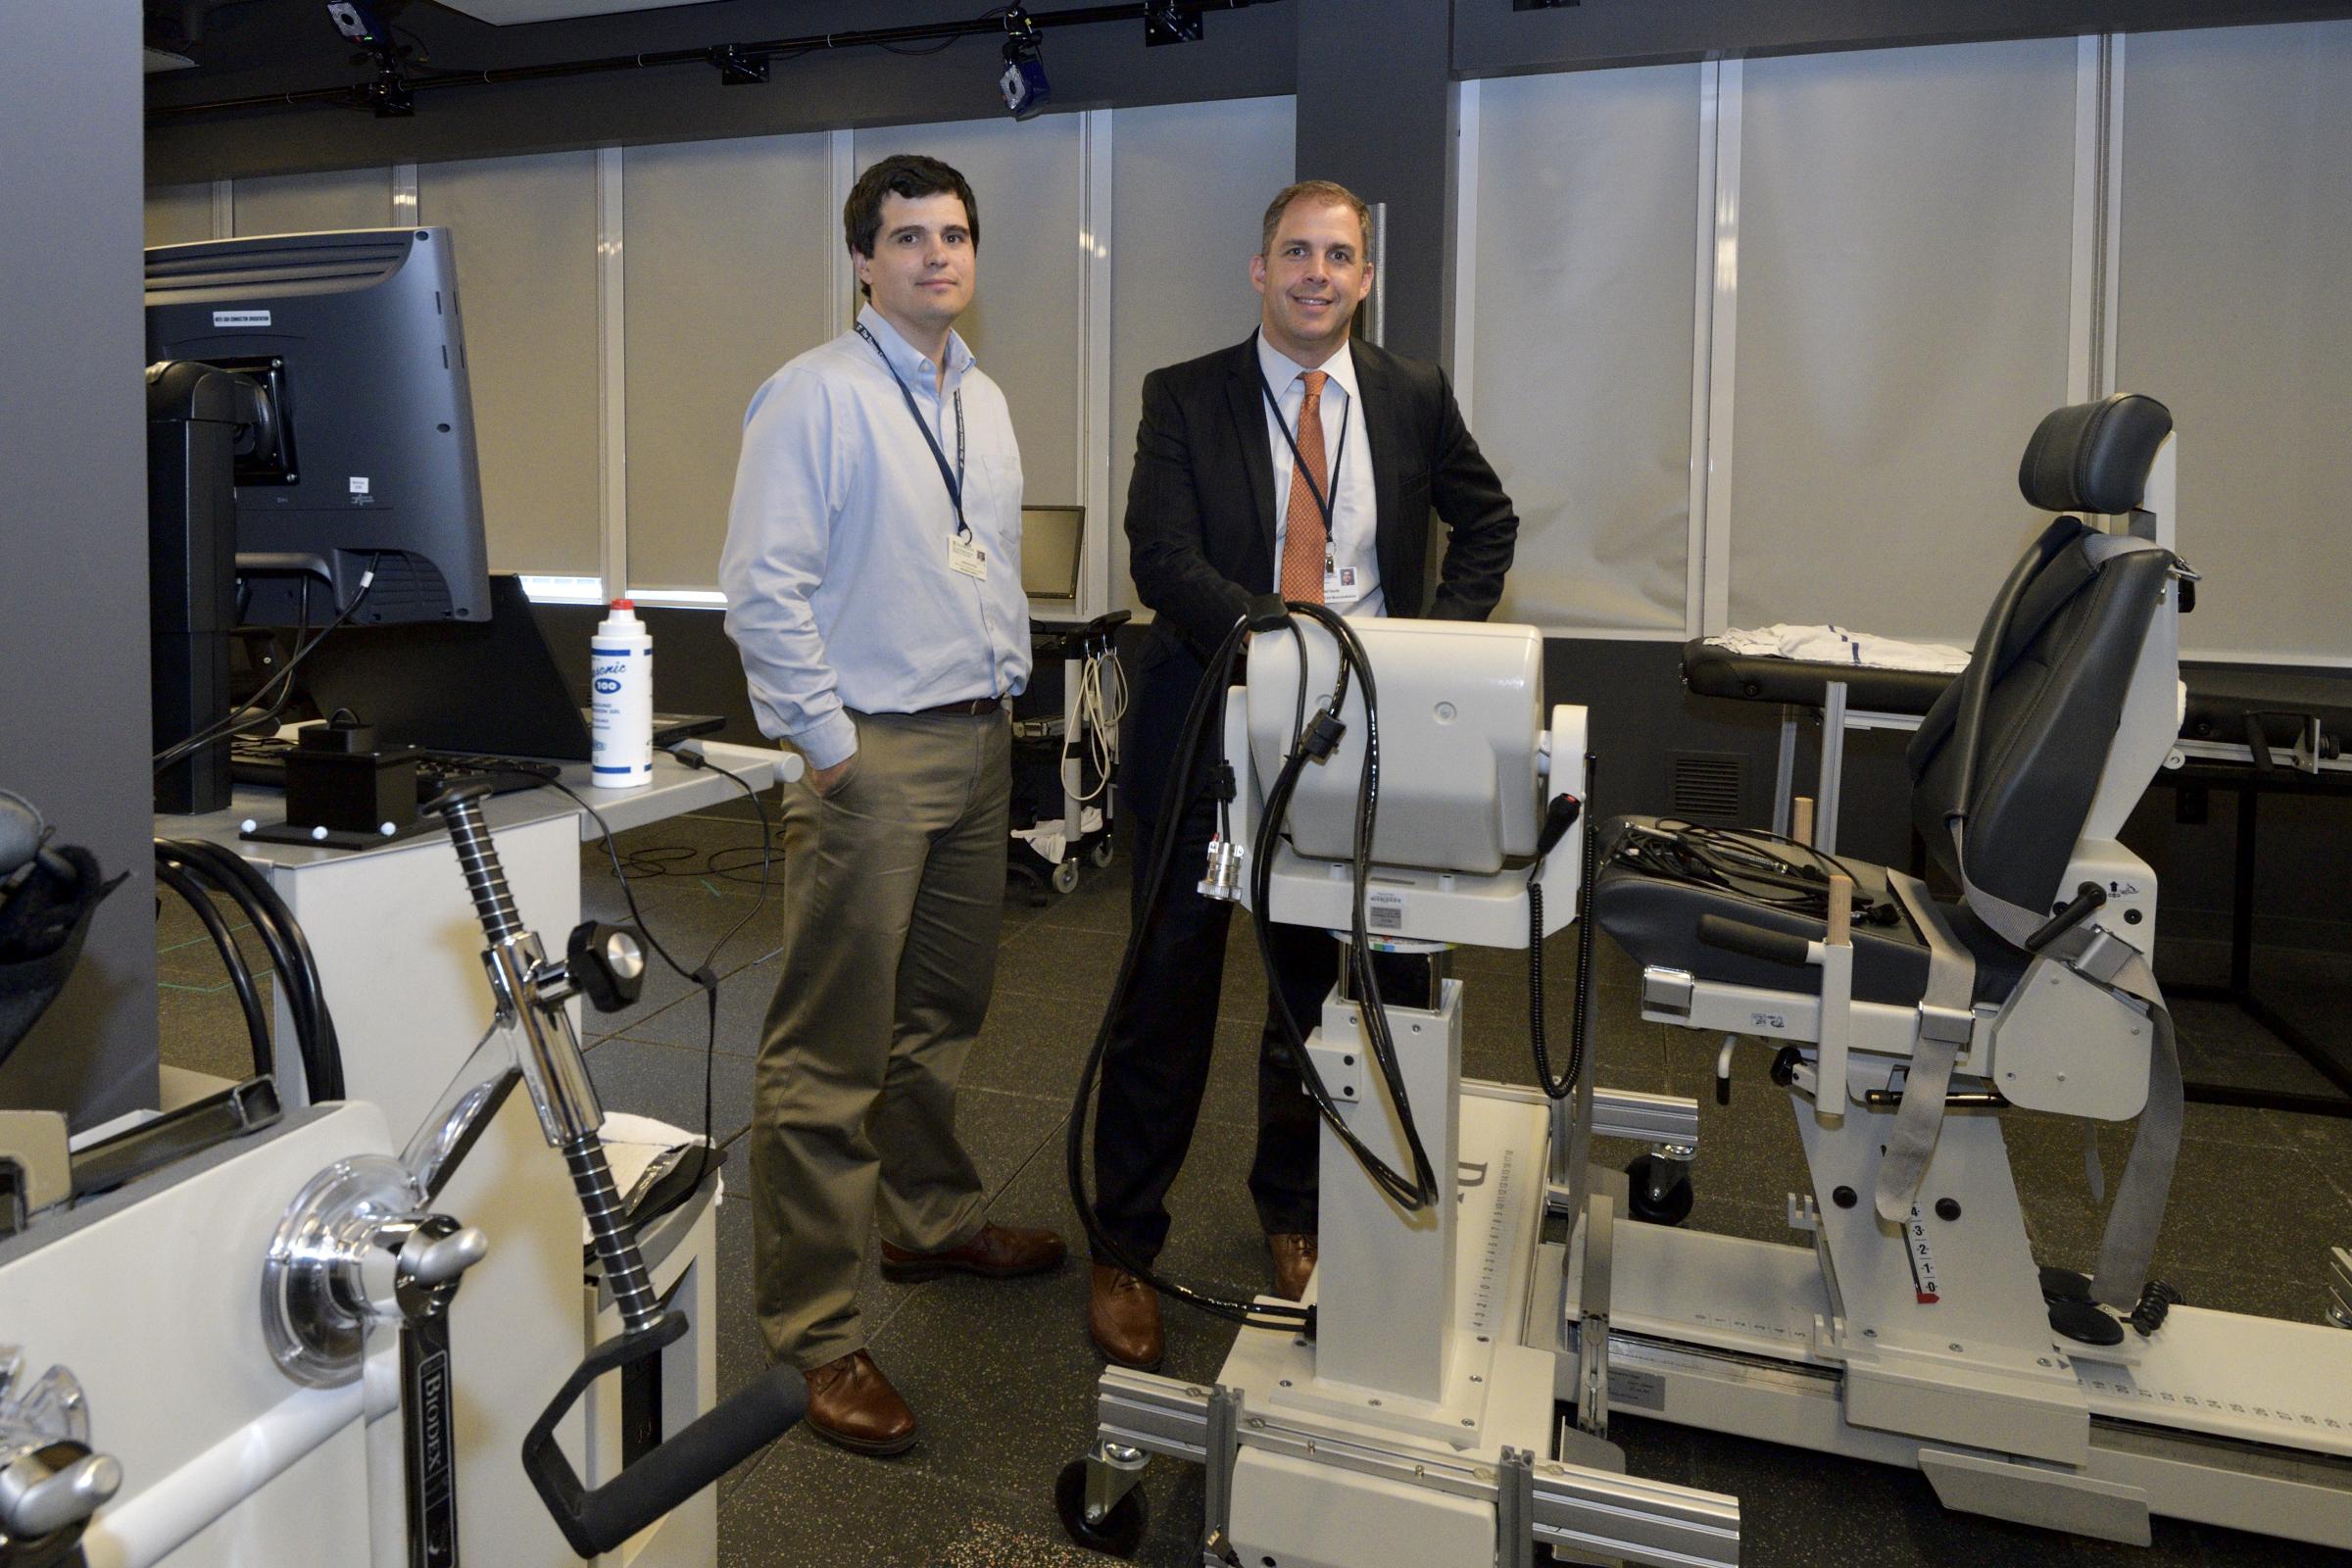 Josh Baxter, left, and Neil Ravitz at the Human Motion Lab.